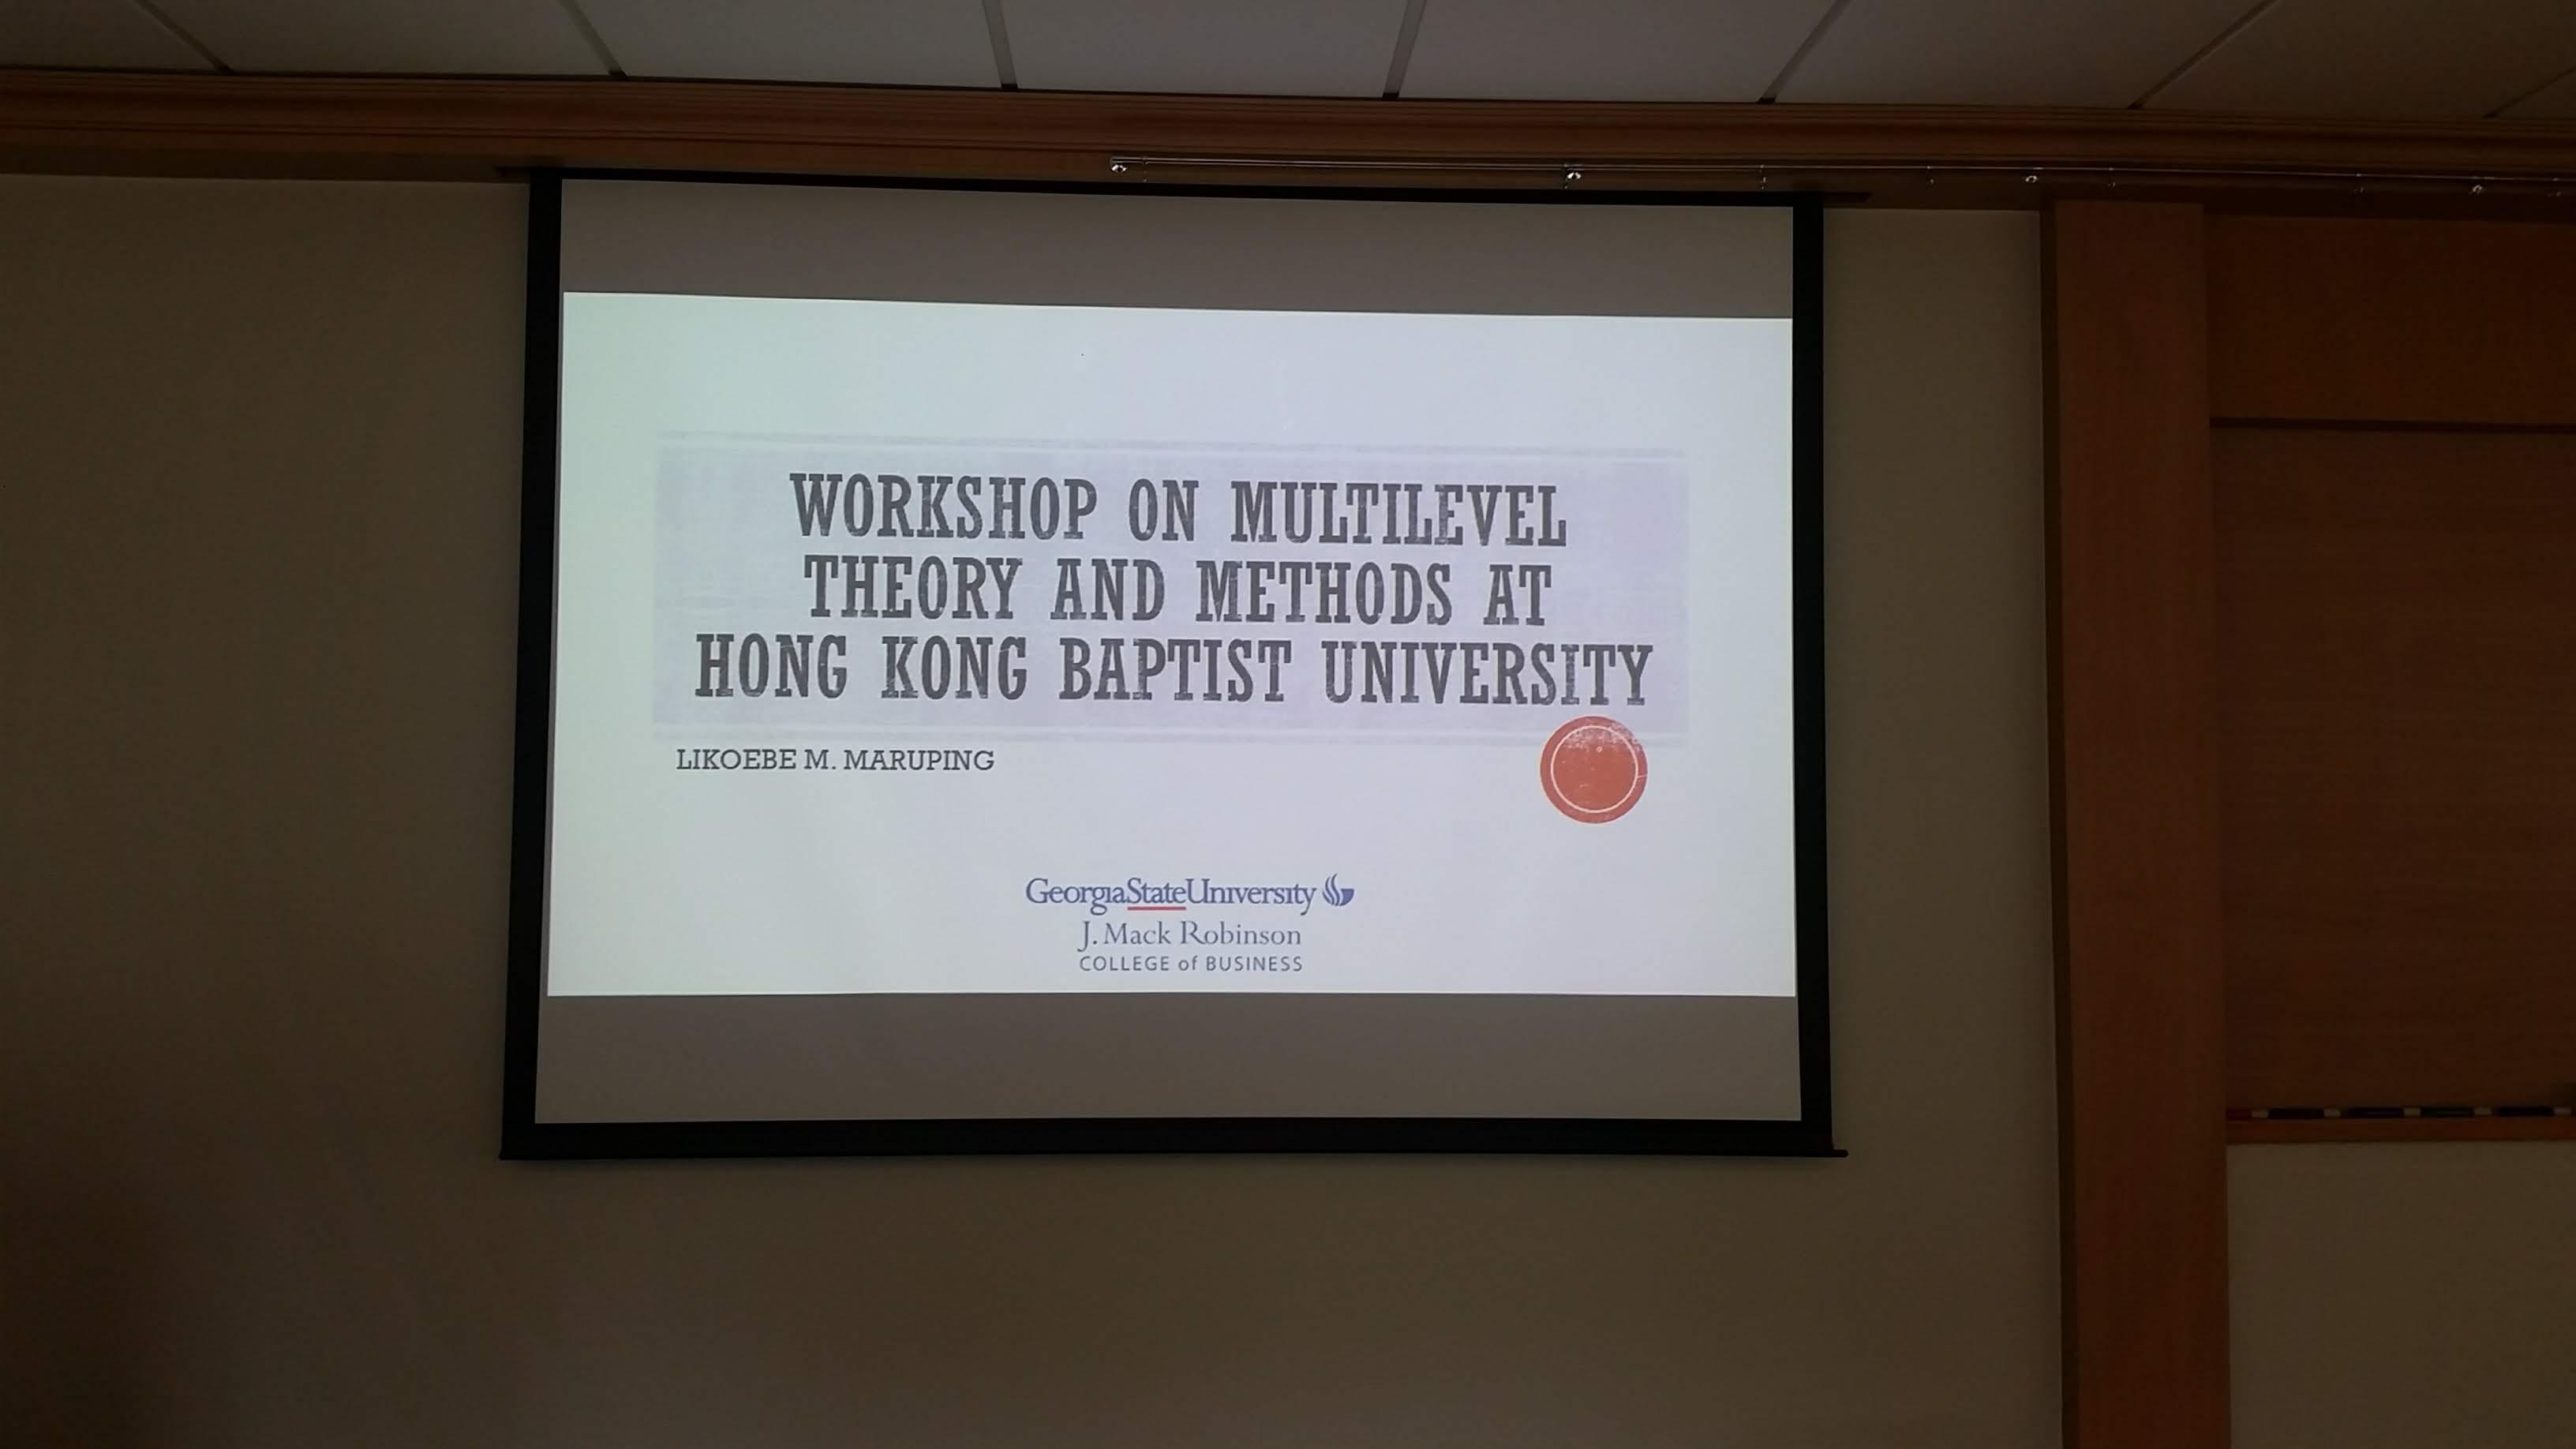 Workshop on Multilevel Theorizing and Analysis